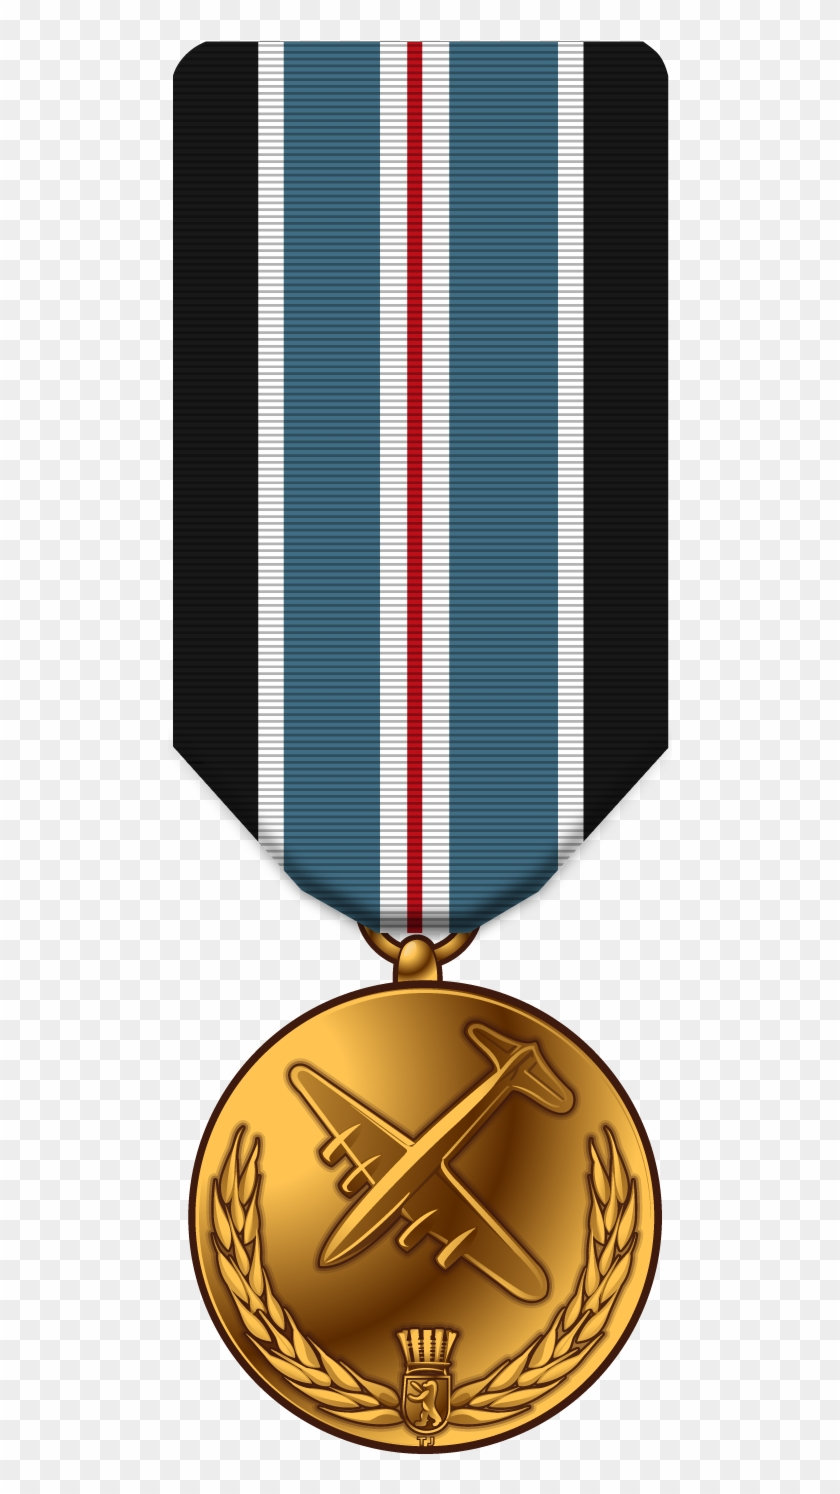 Medal For Humane Action - Medal For Humane Action #249093